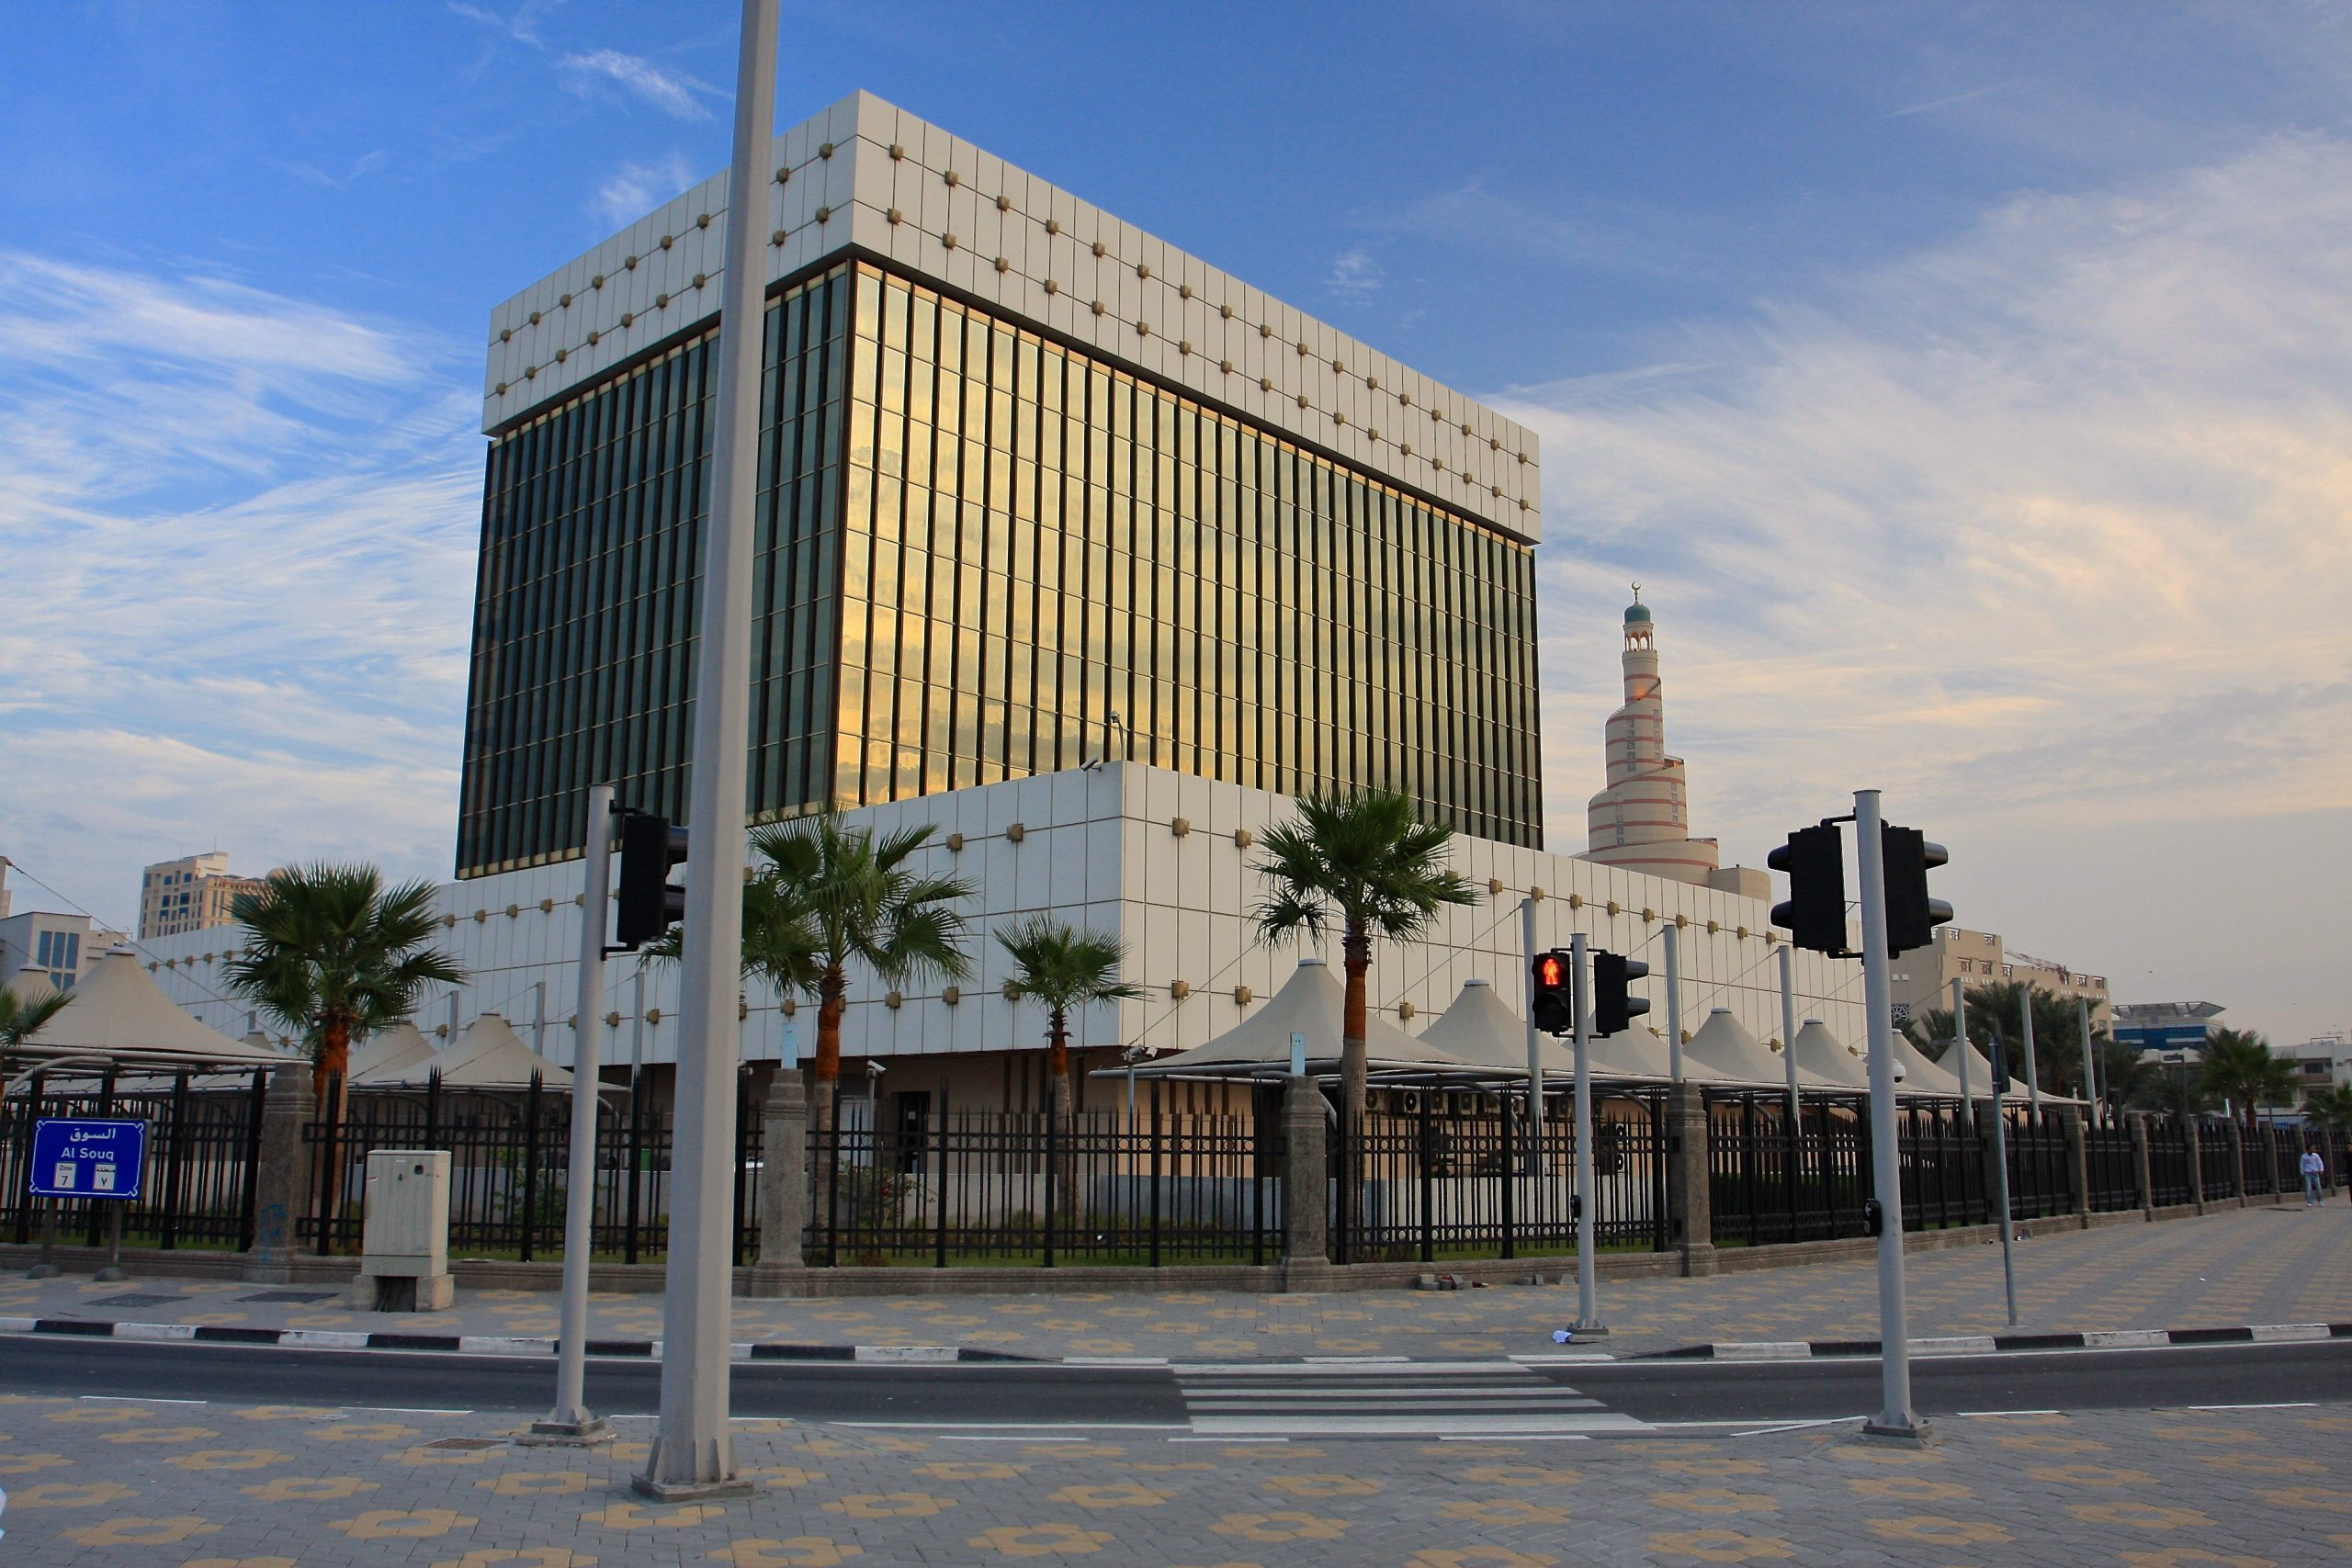 QCB Issues New Instructions to Banks Regarding Bounced Checks